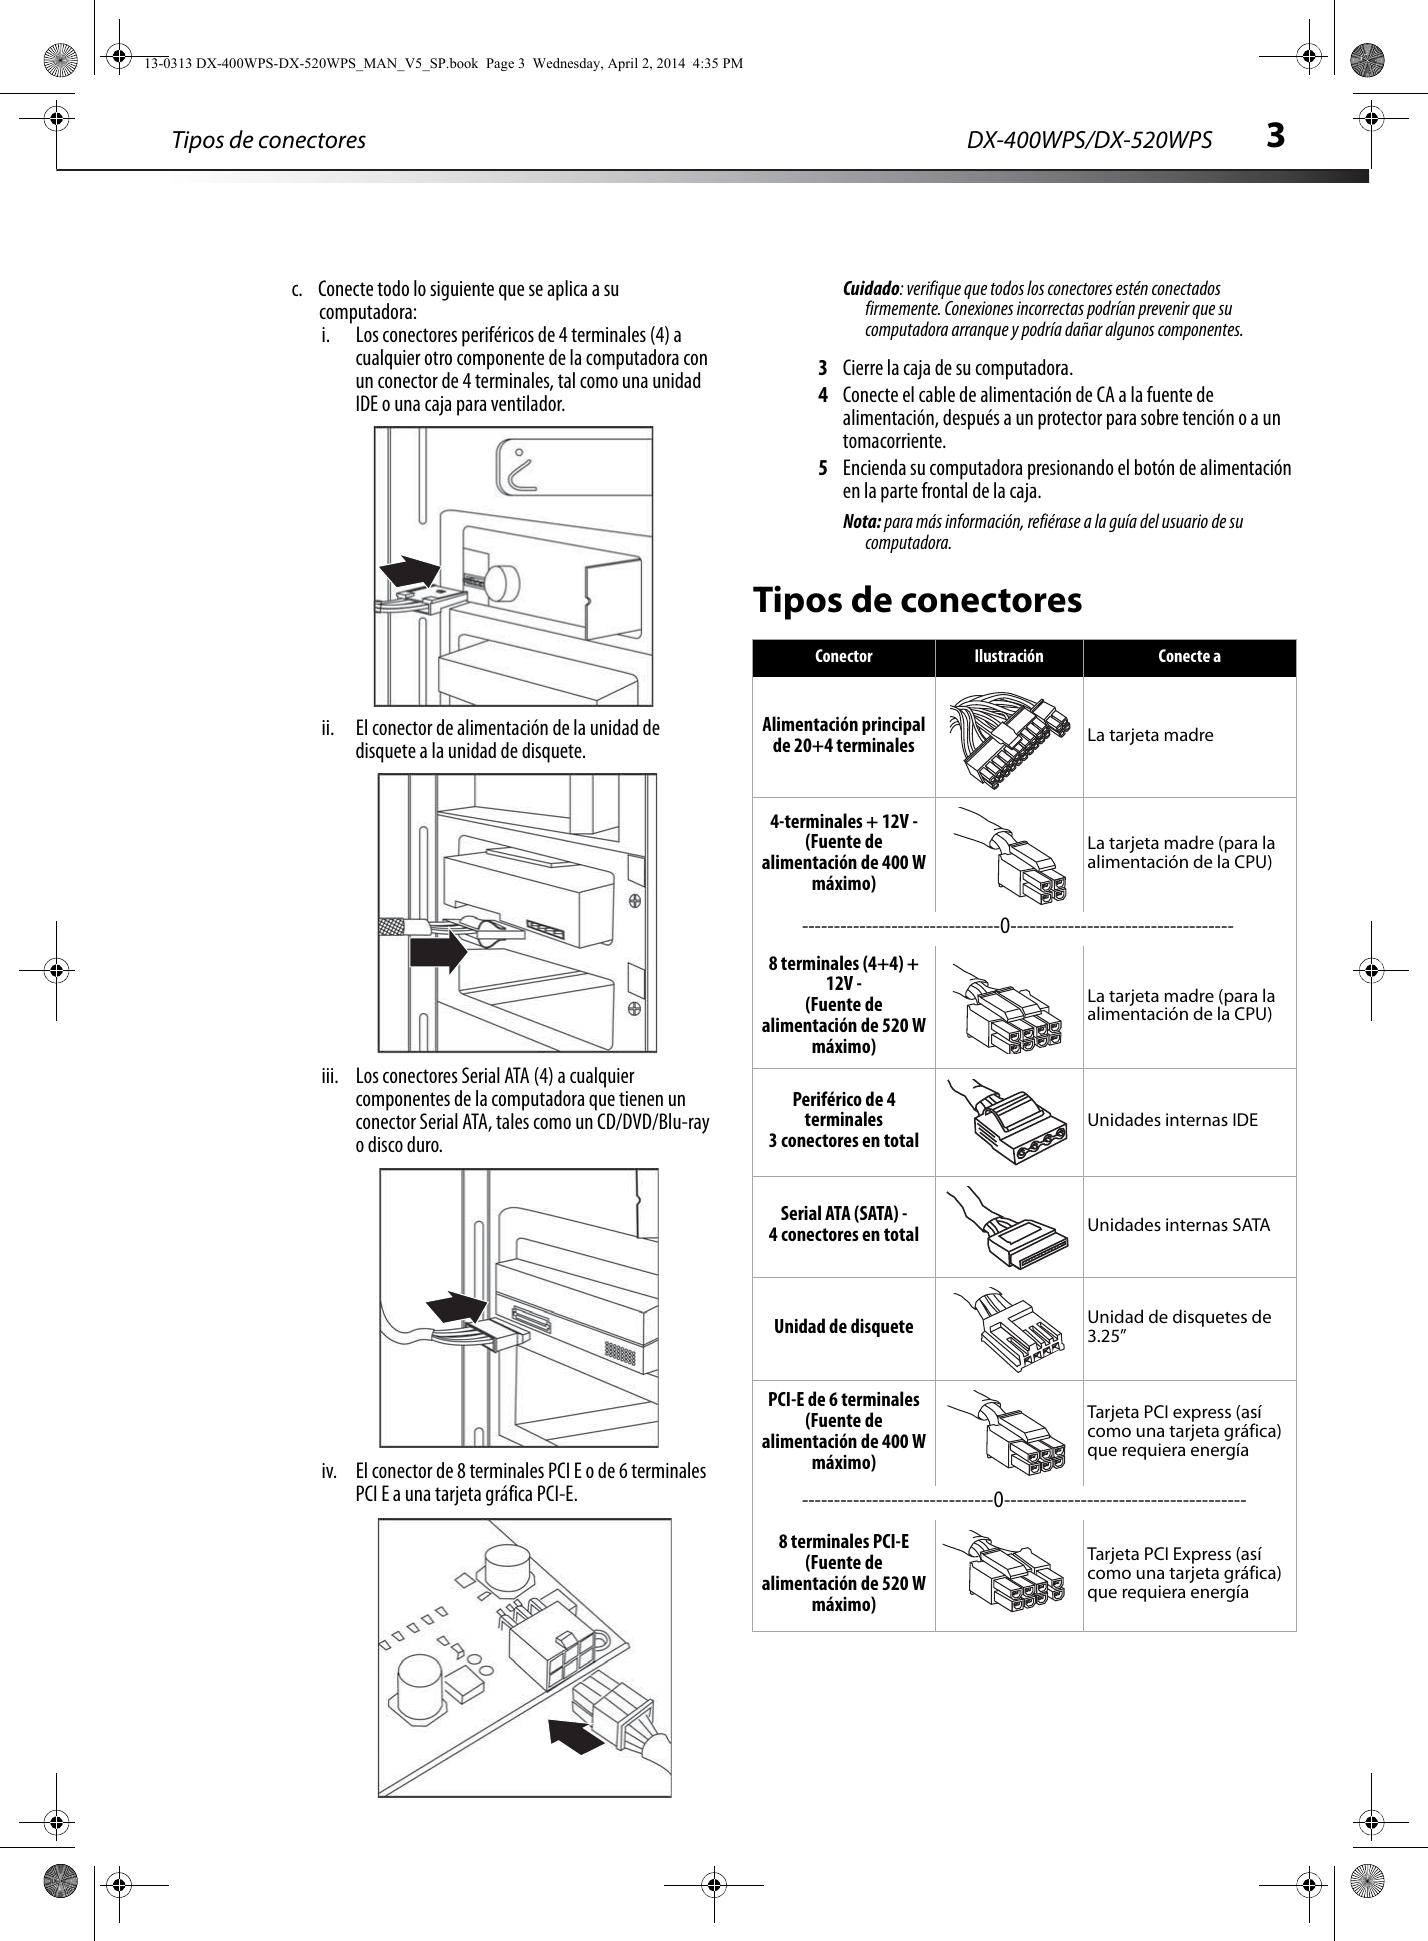 dynex 400 watt atx cpu power supply white users manual 13 0313 dx rh usermanual wiki User Manual Word Manual Guide